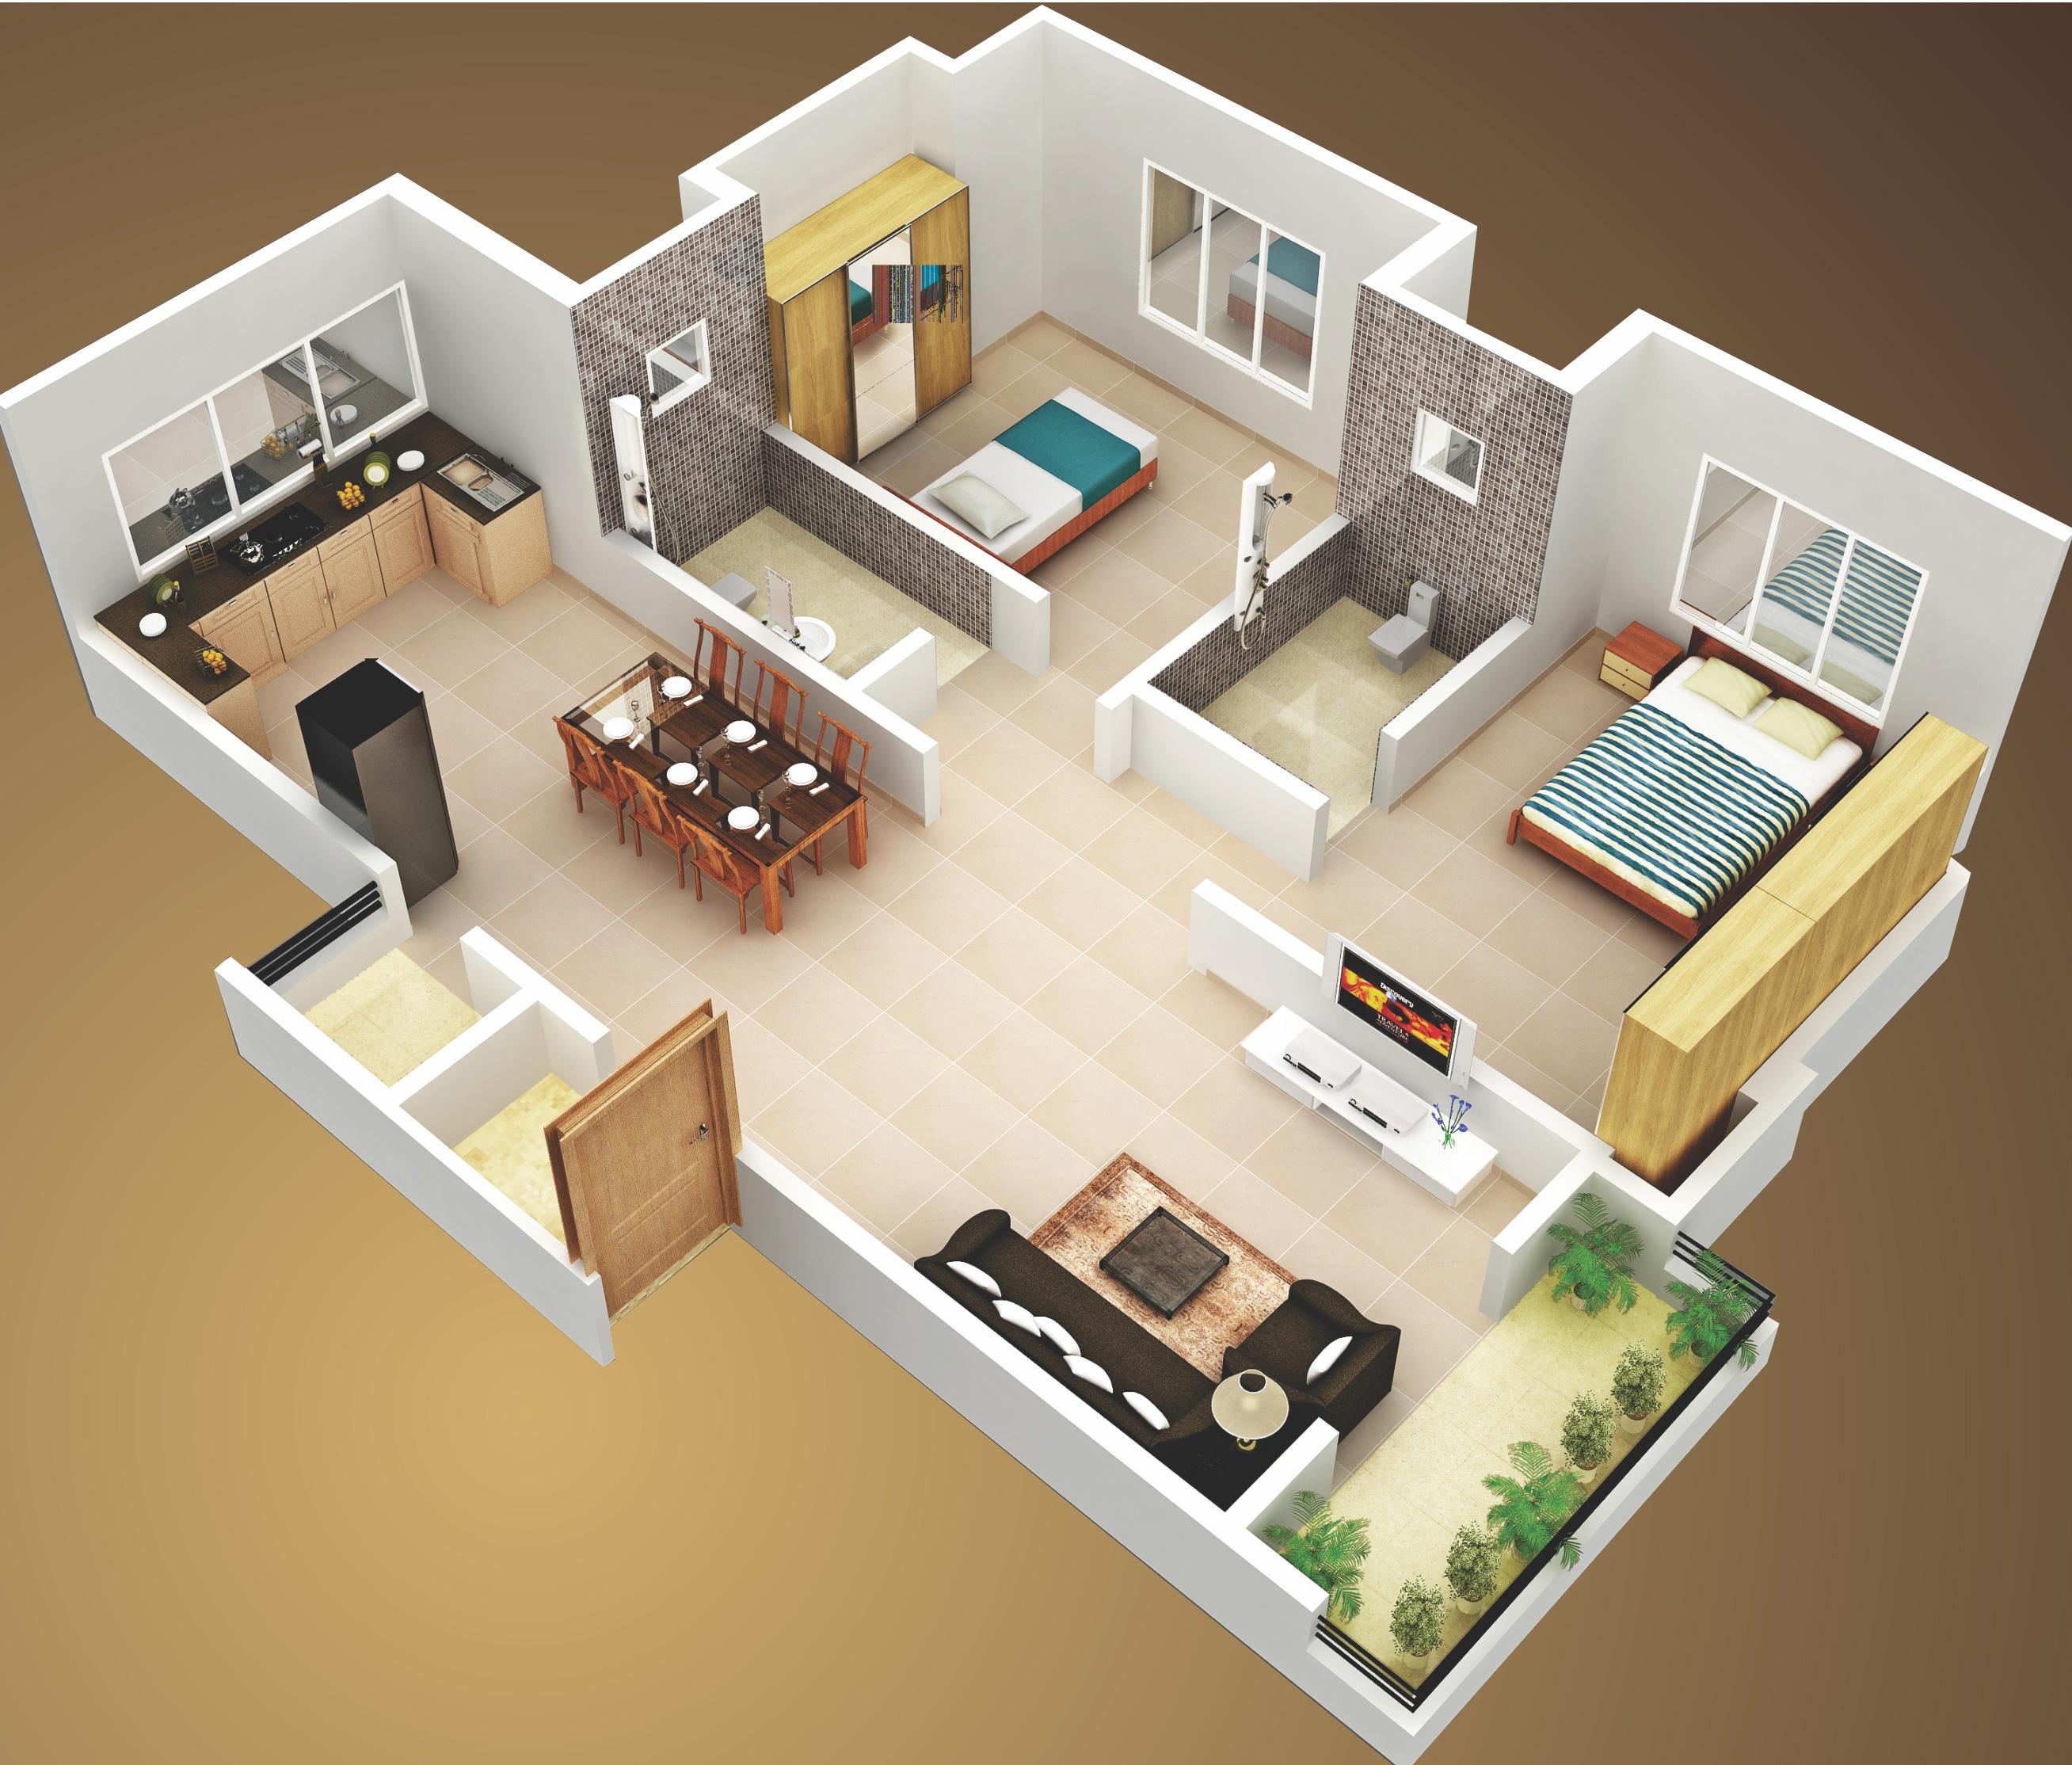 25 More 3 Bedroom 3D Floor Plans  Interior Design Ideas